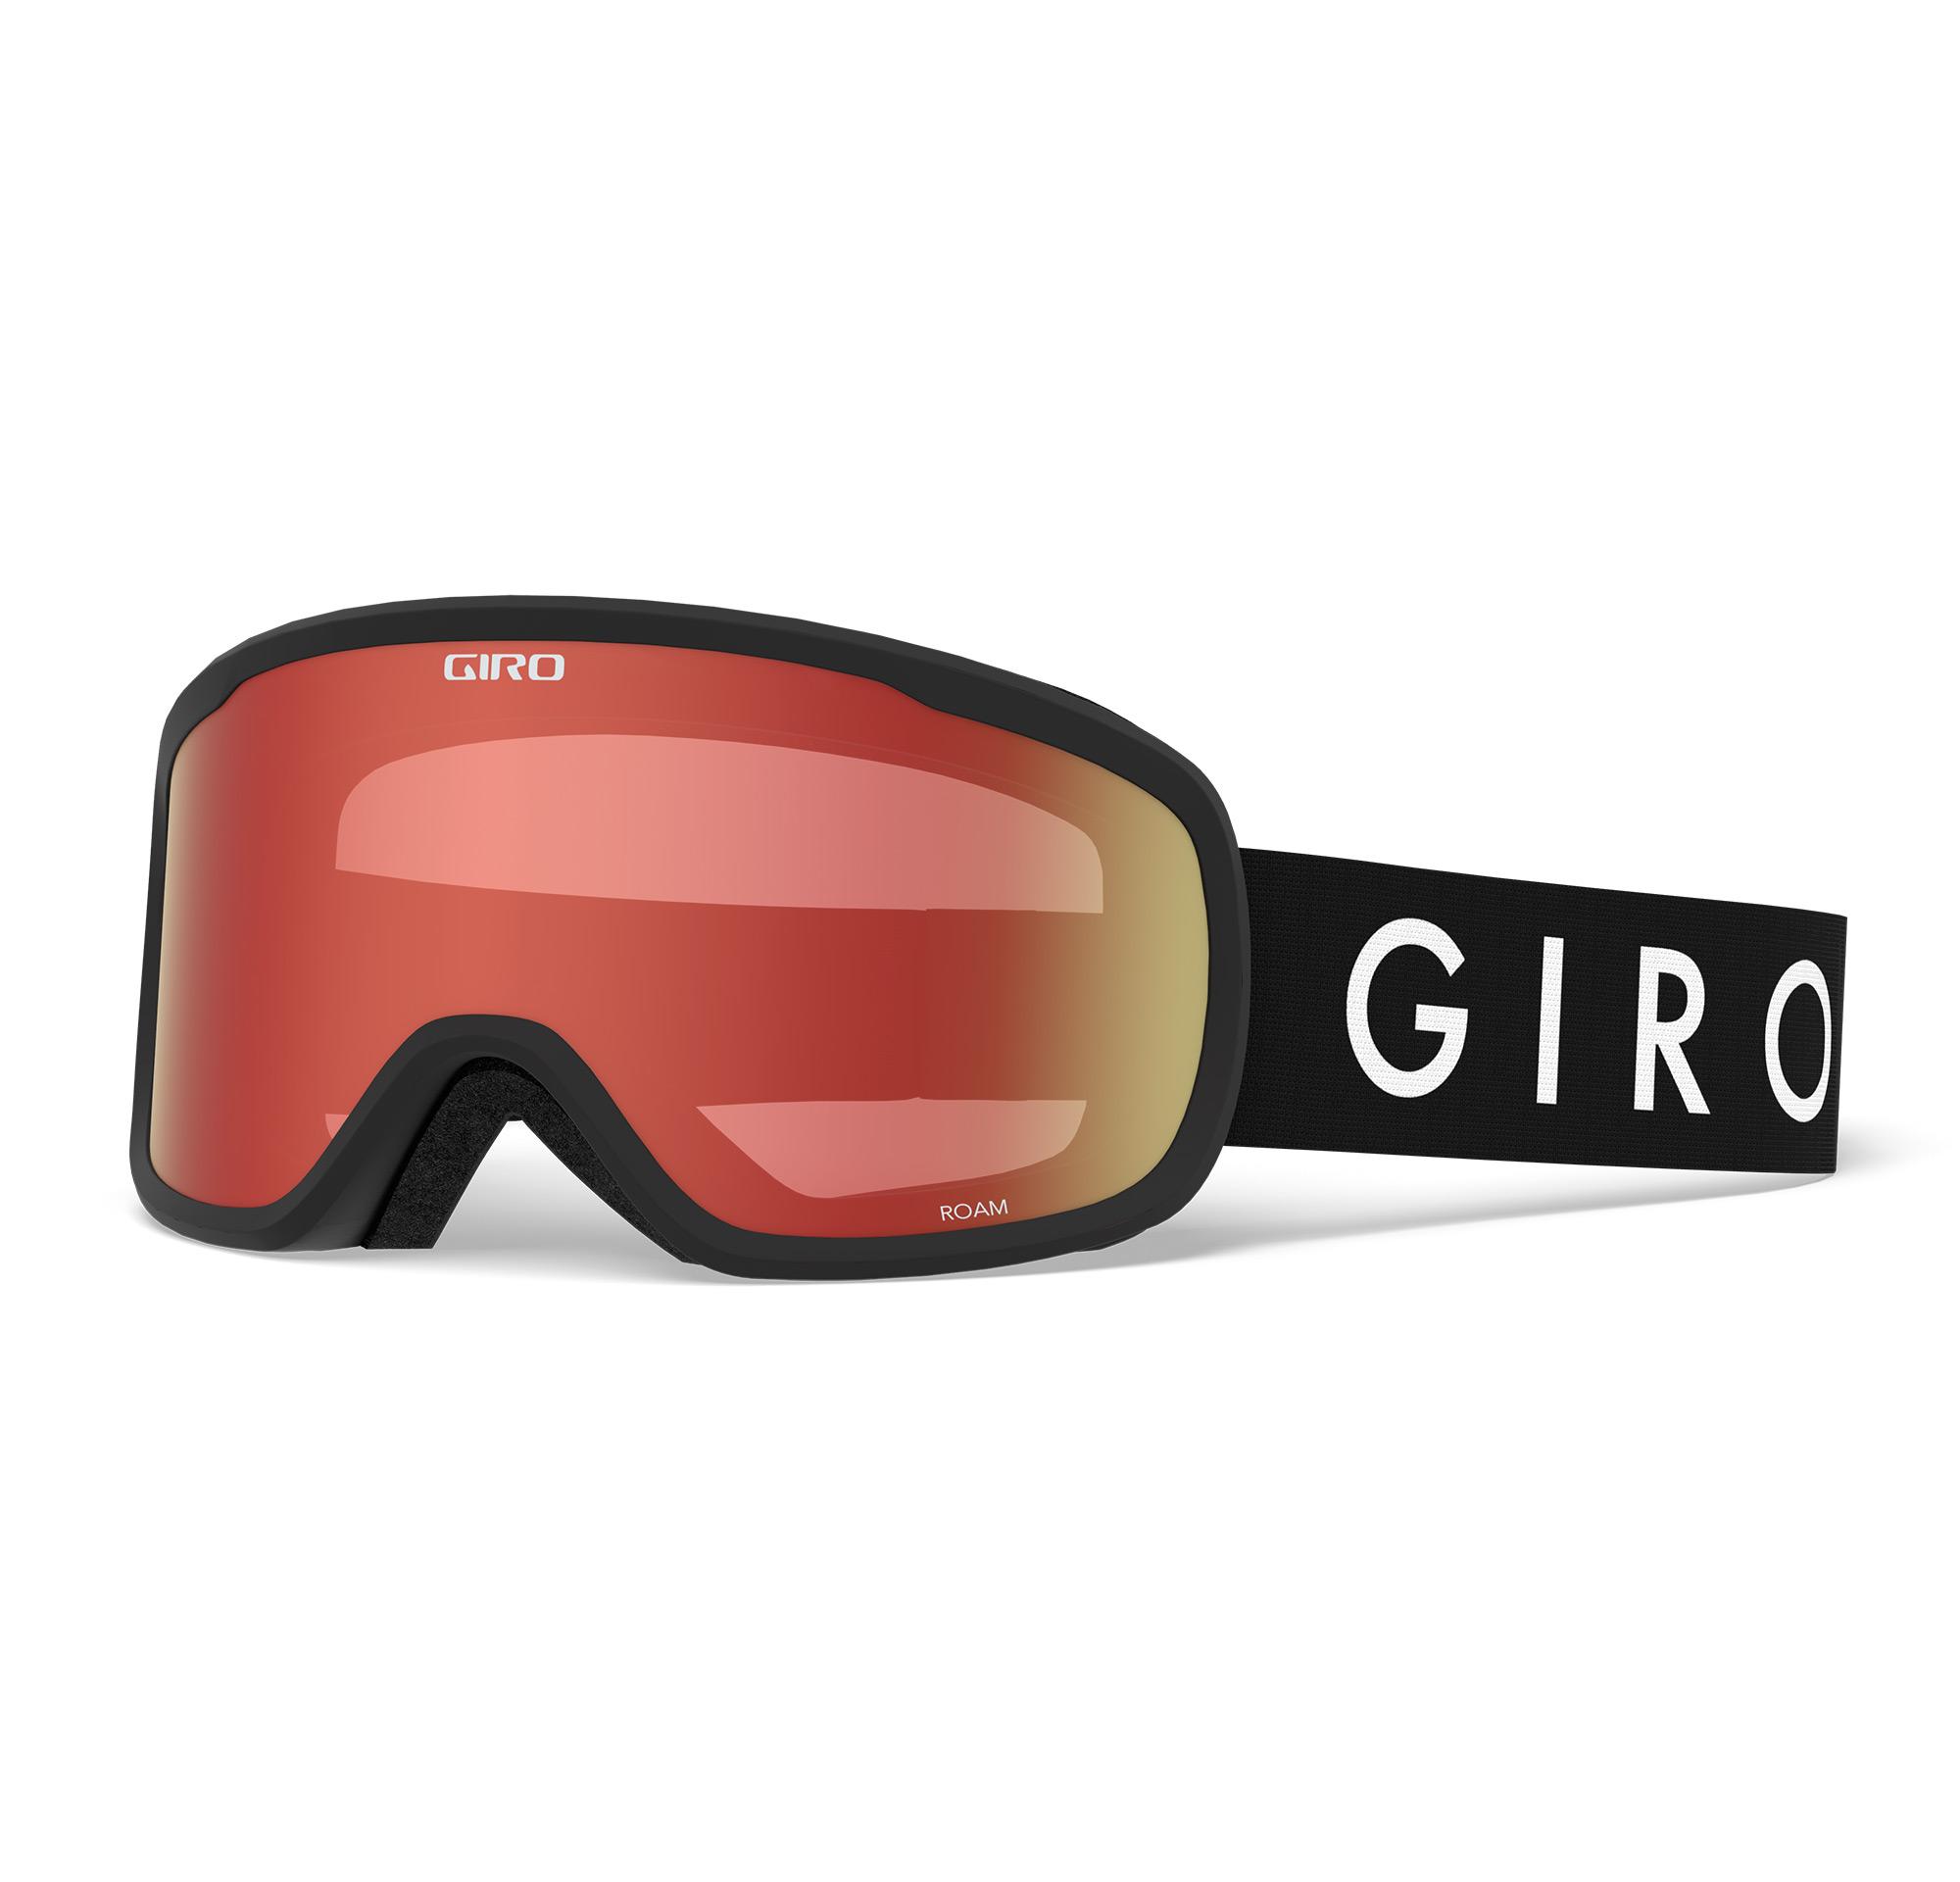 giro-roam-snow-goggle-black-core-amber-scarlet-7083588-hero.jpg